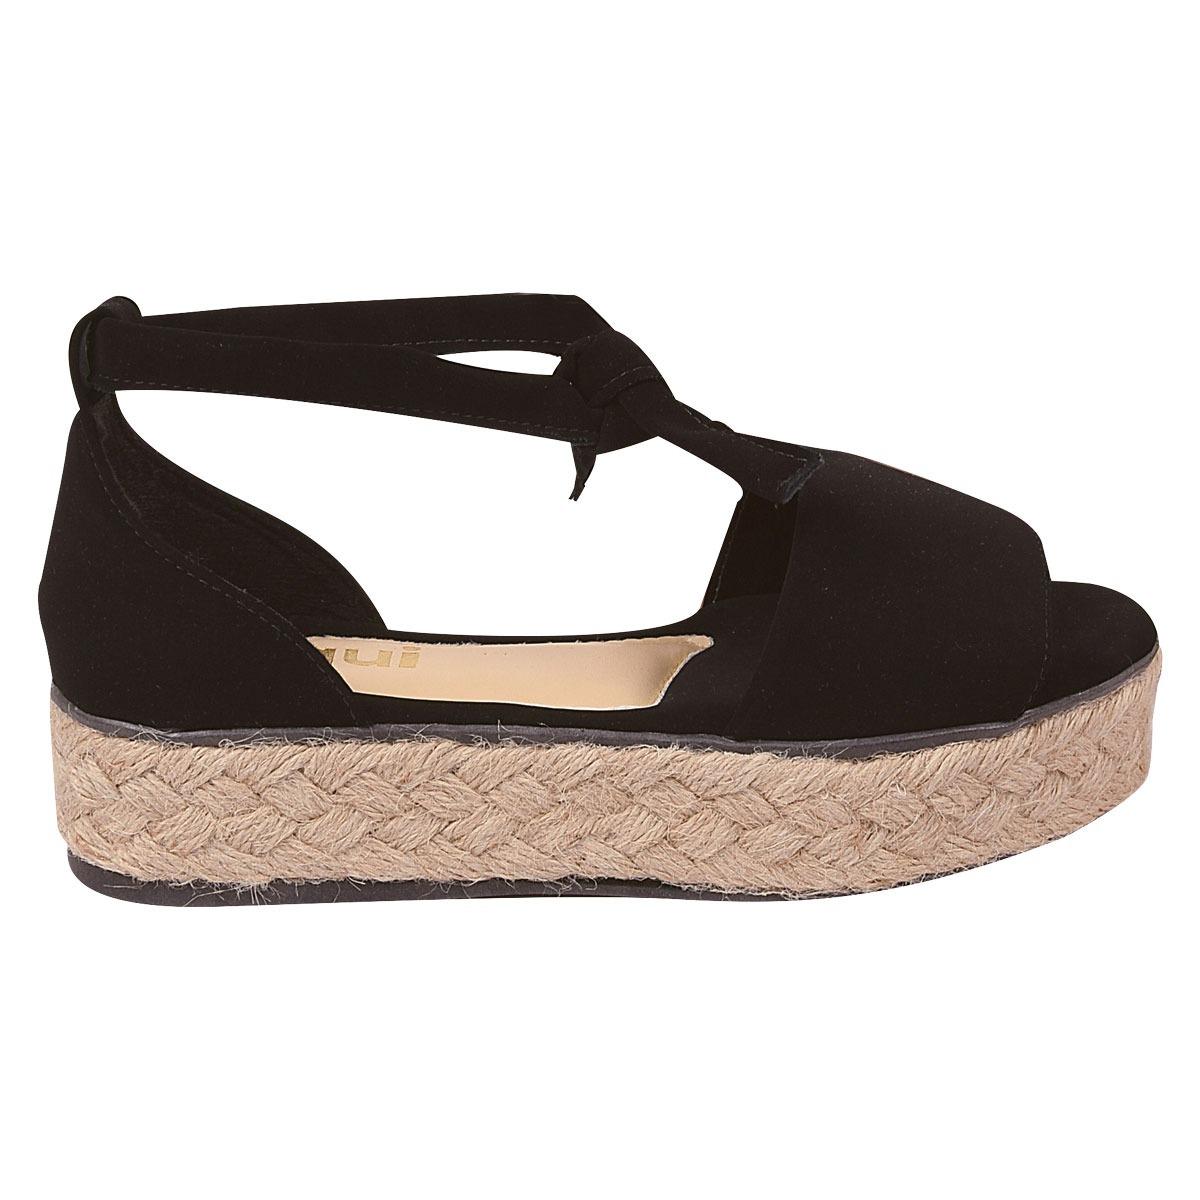 296ddba7e6 sandalia feminina anabela plataforma tratorada flatform bra9. Carregando  zoom.